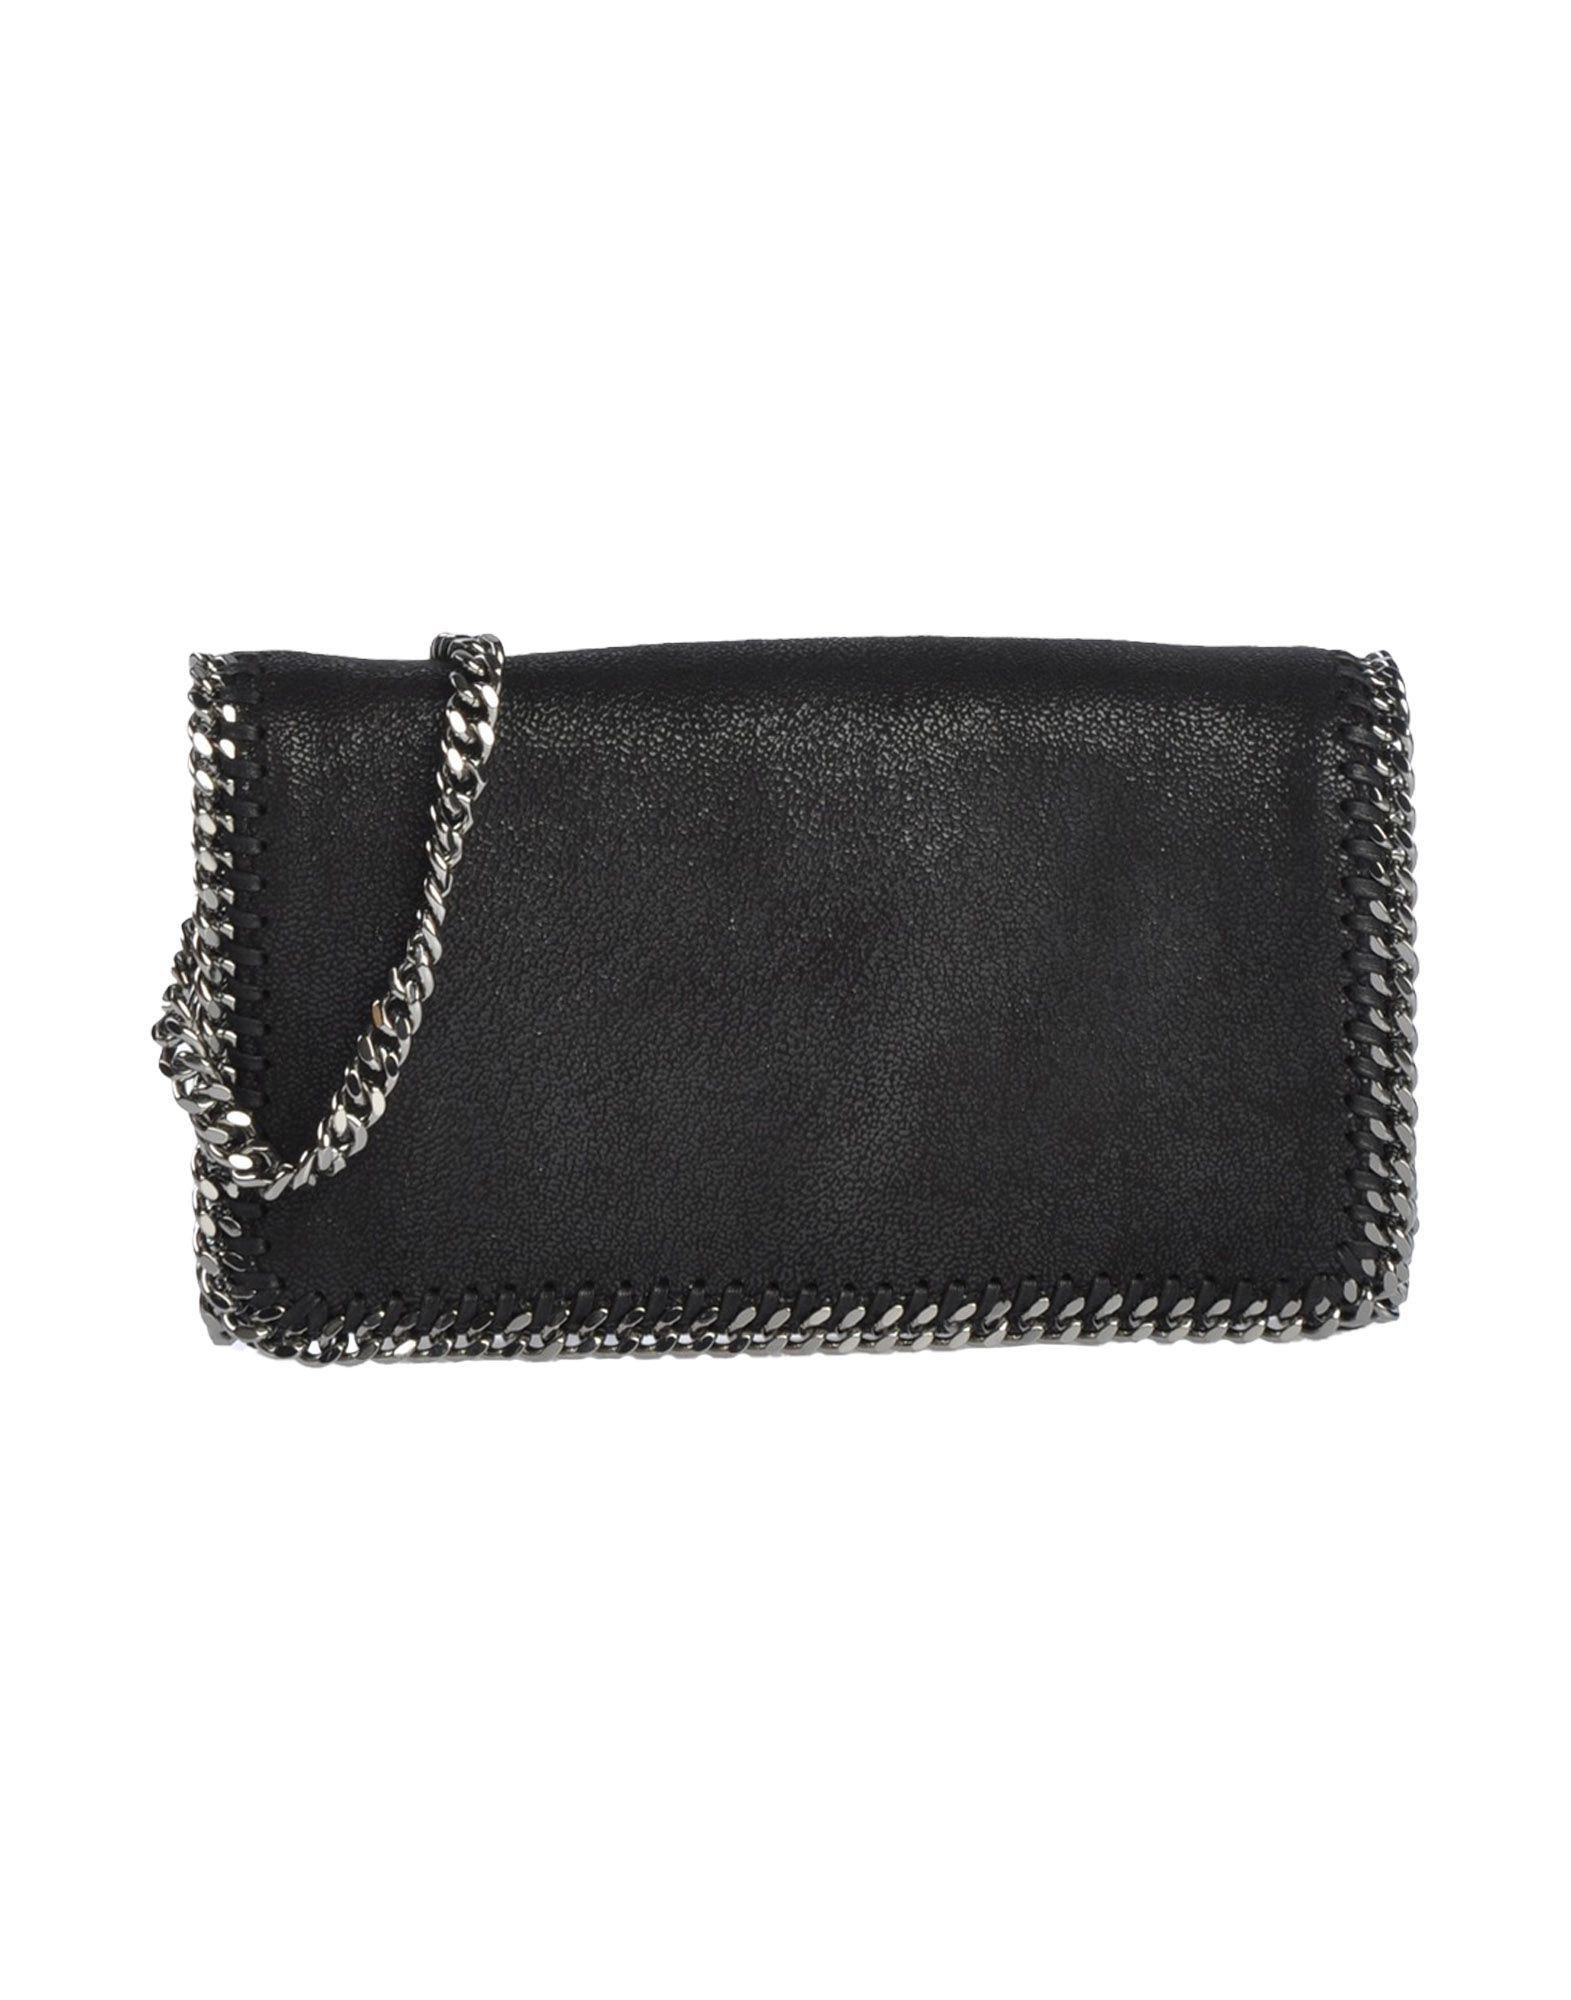 0e15413c8ac2 Stella McCartney Mini Classic Crossbody Bag w Silver Hardware ...